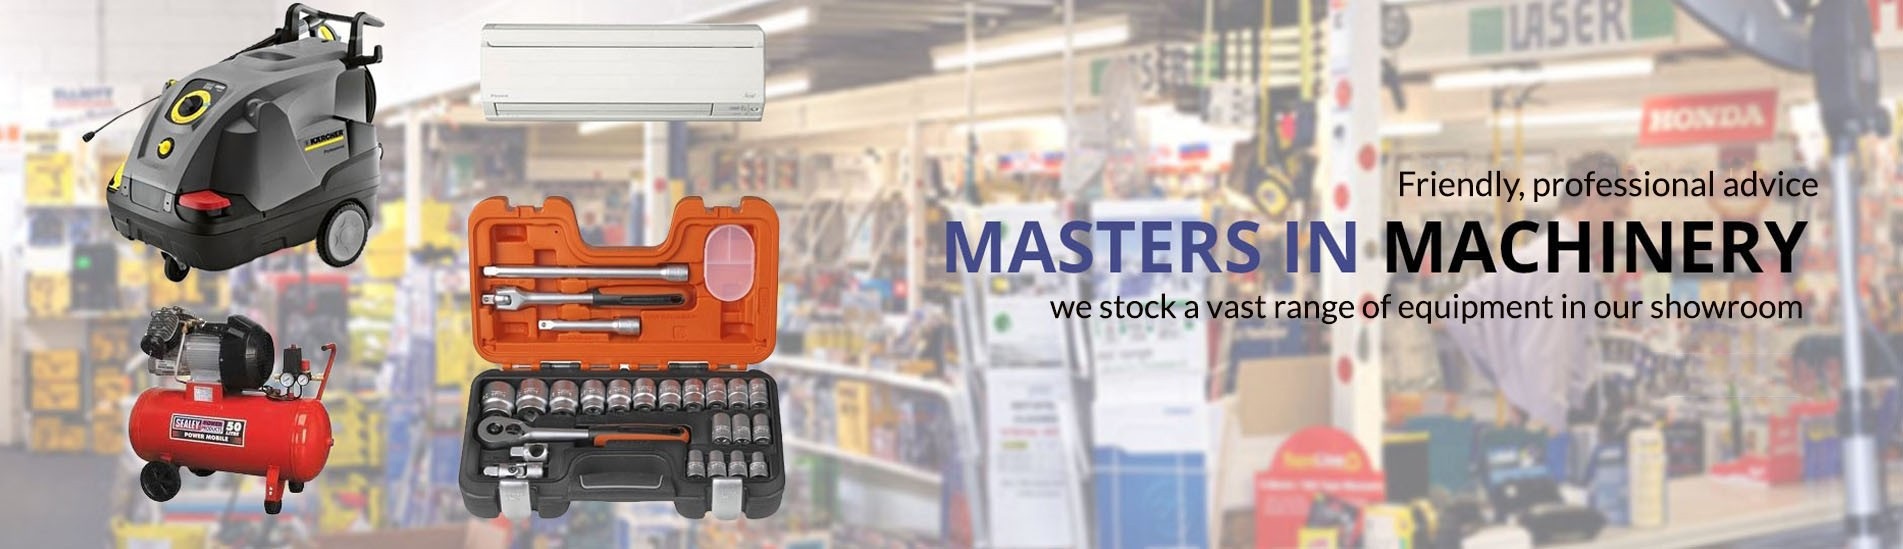 Elliotts Masters in Machinery